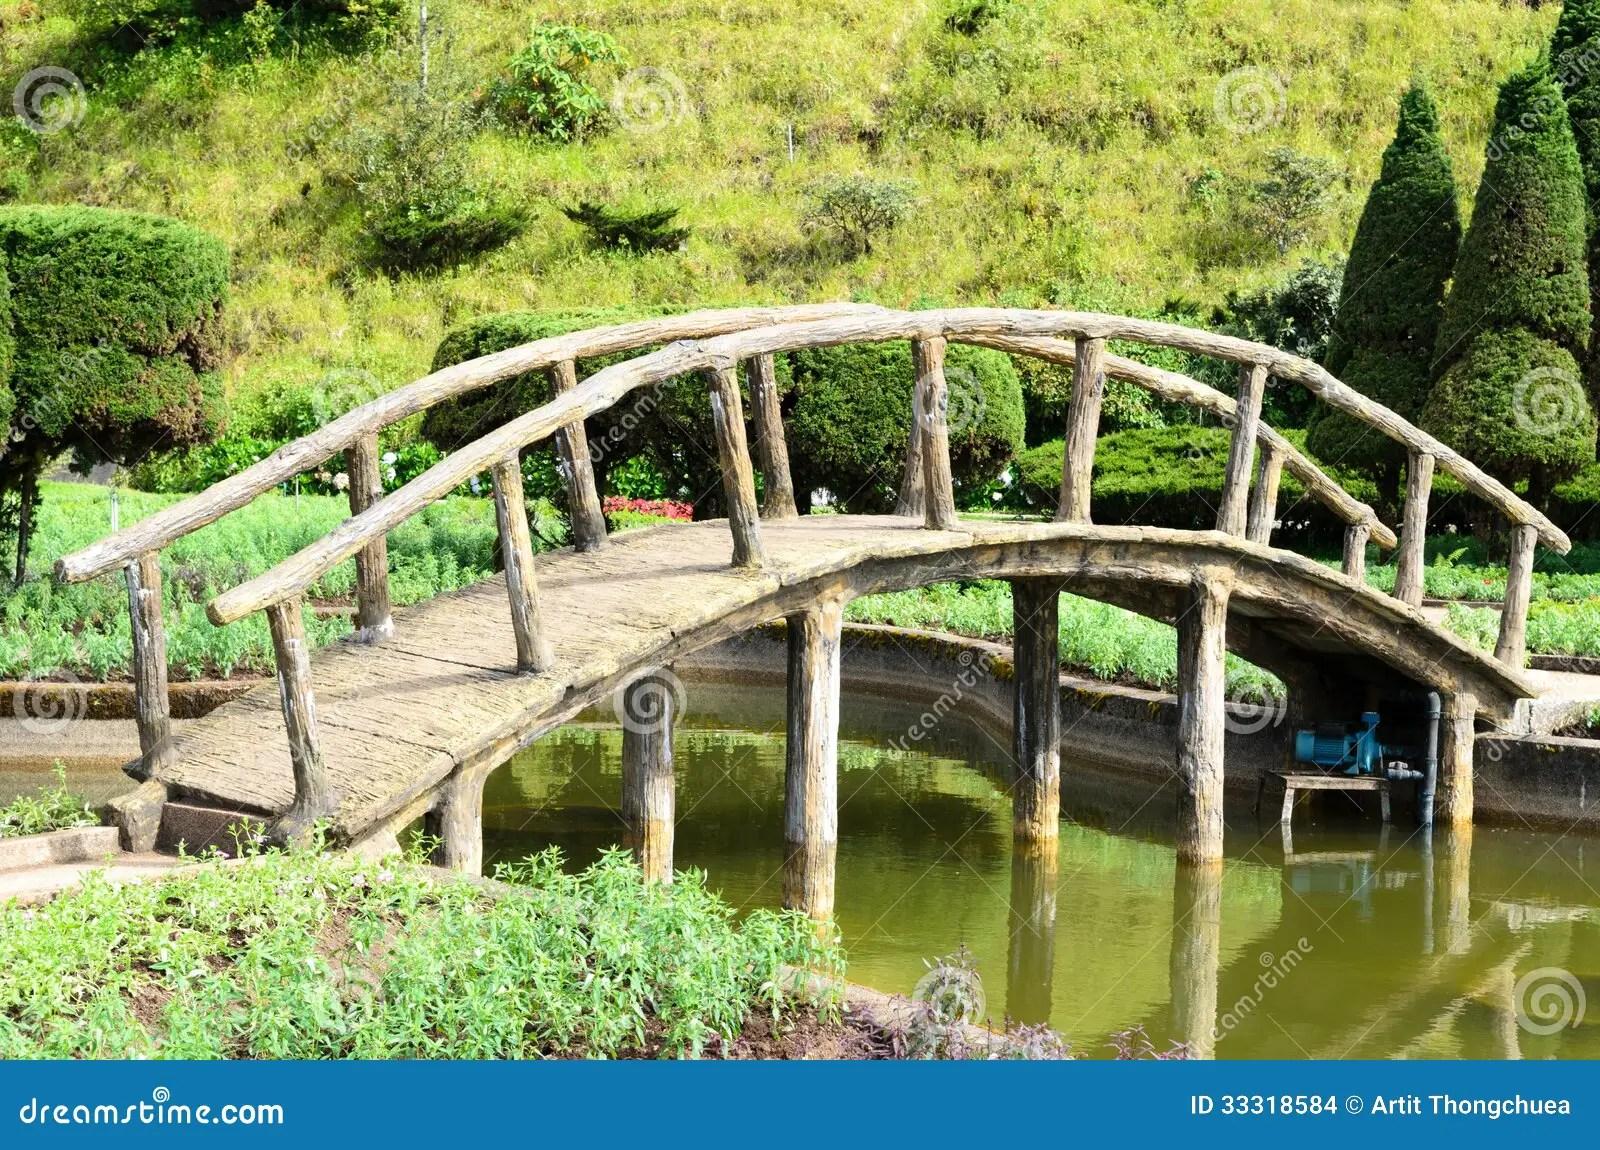 A Peaceful Little Rock Bridge Stock Photo Image Of